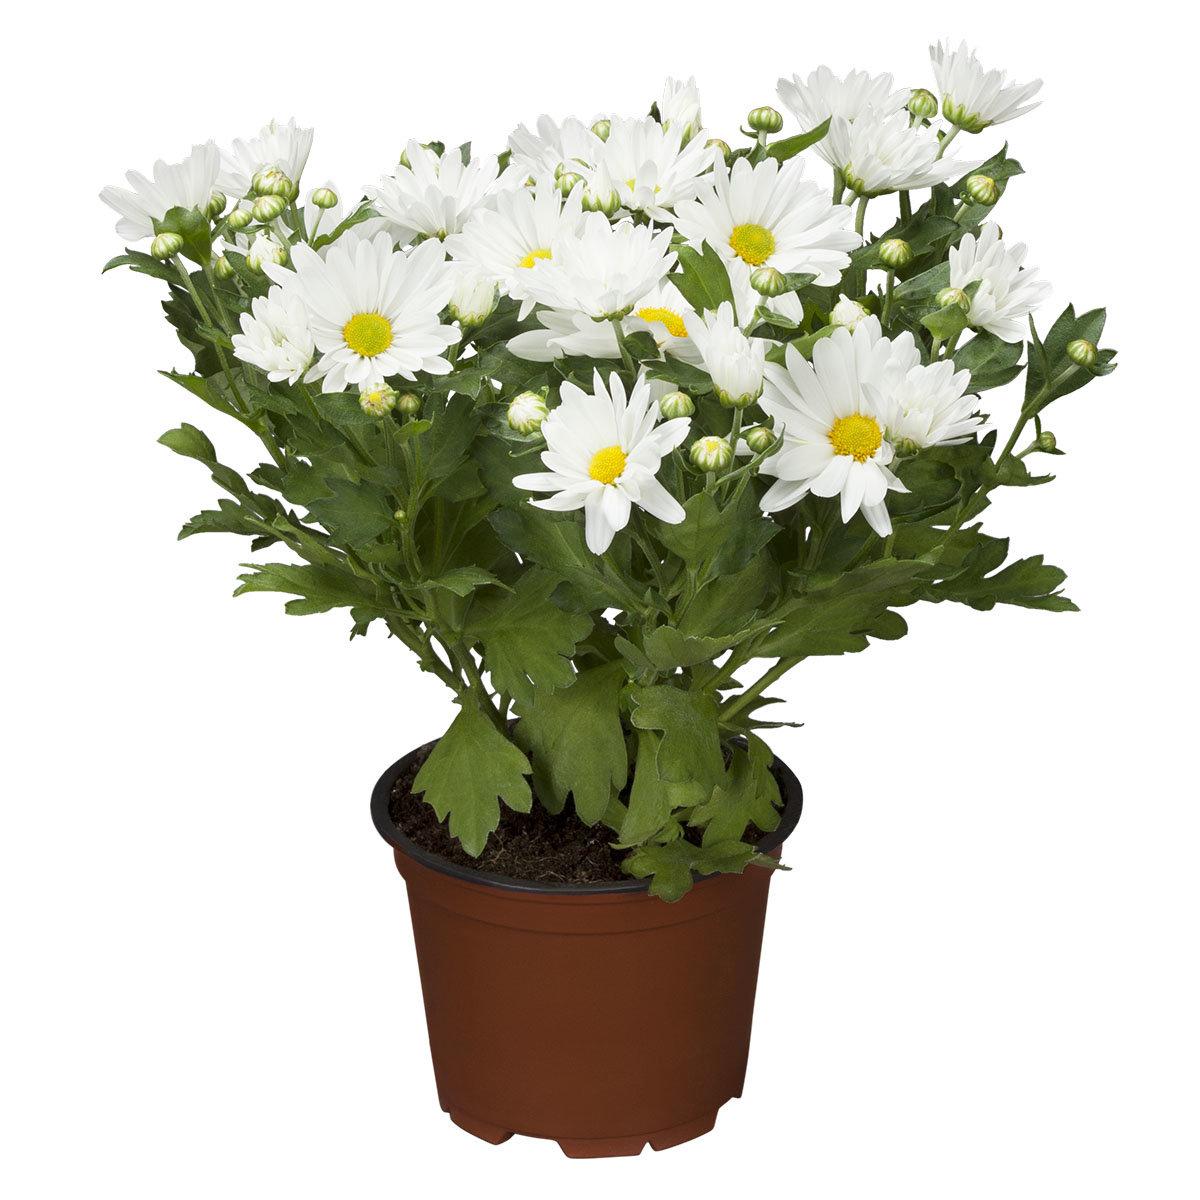 Herbst-Chrysantheme, weiß